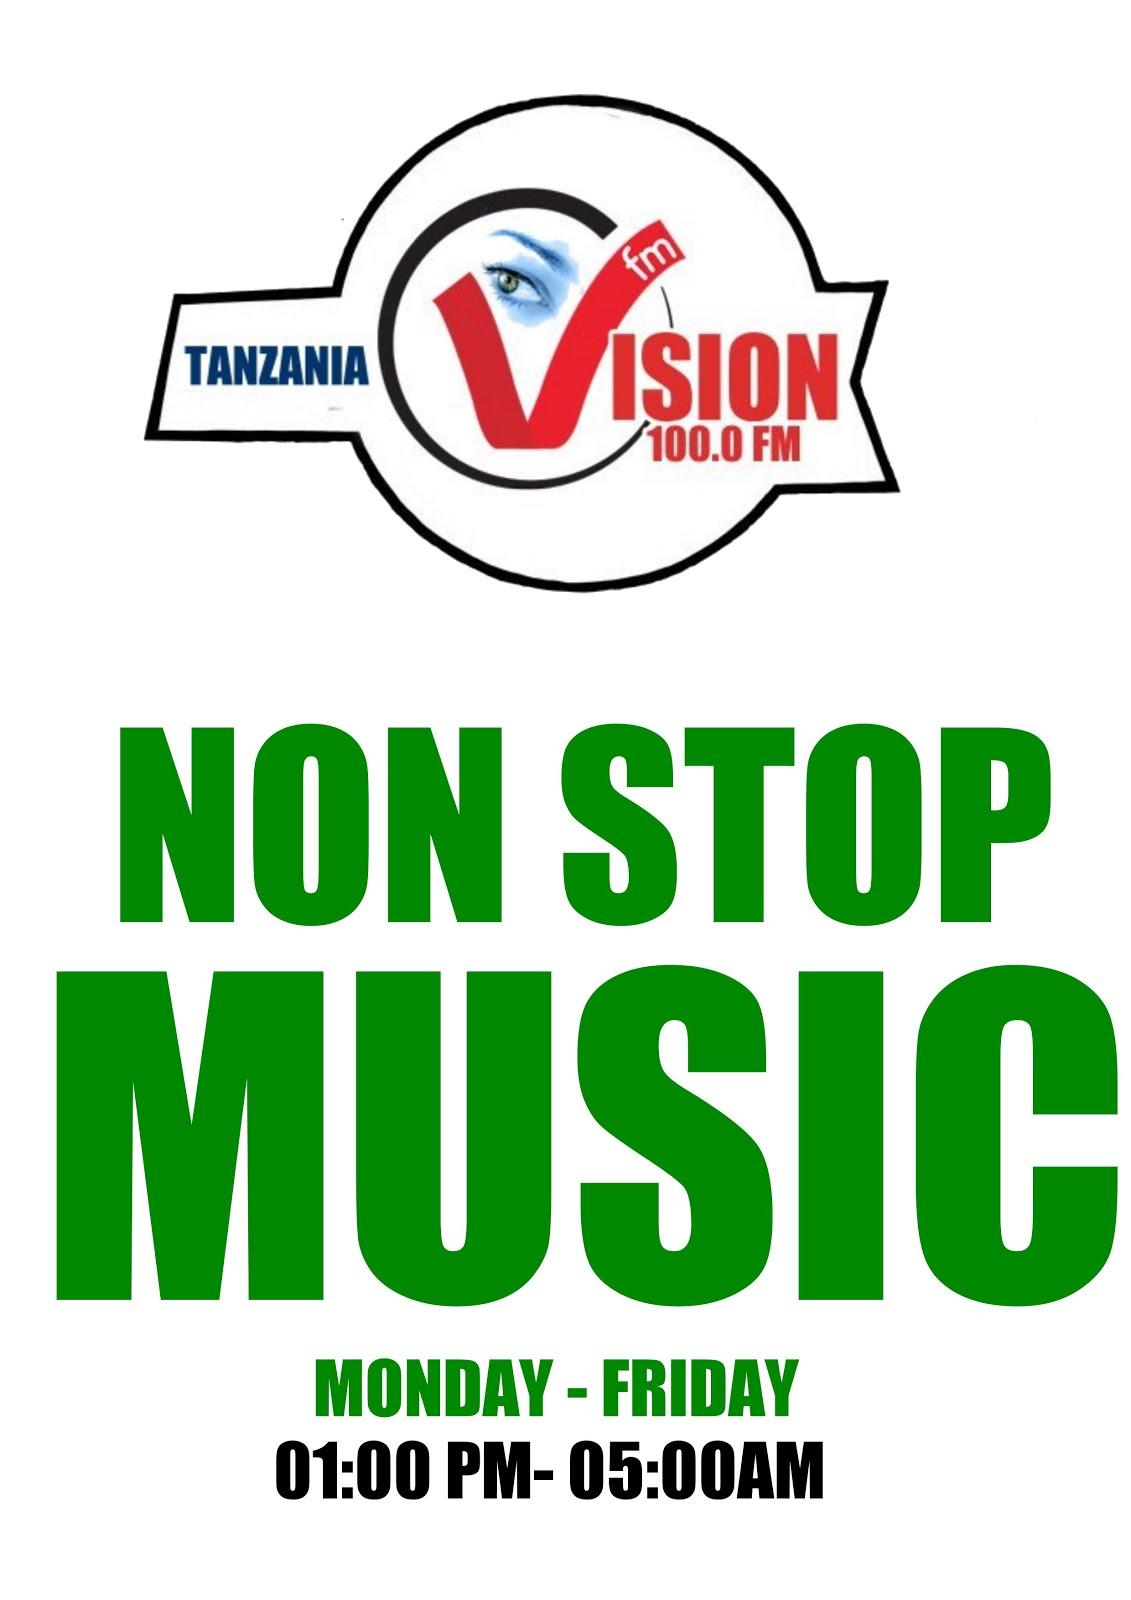 RADIO VISION FM TANZANIA: NEW SKEBO MUSIC